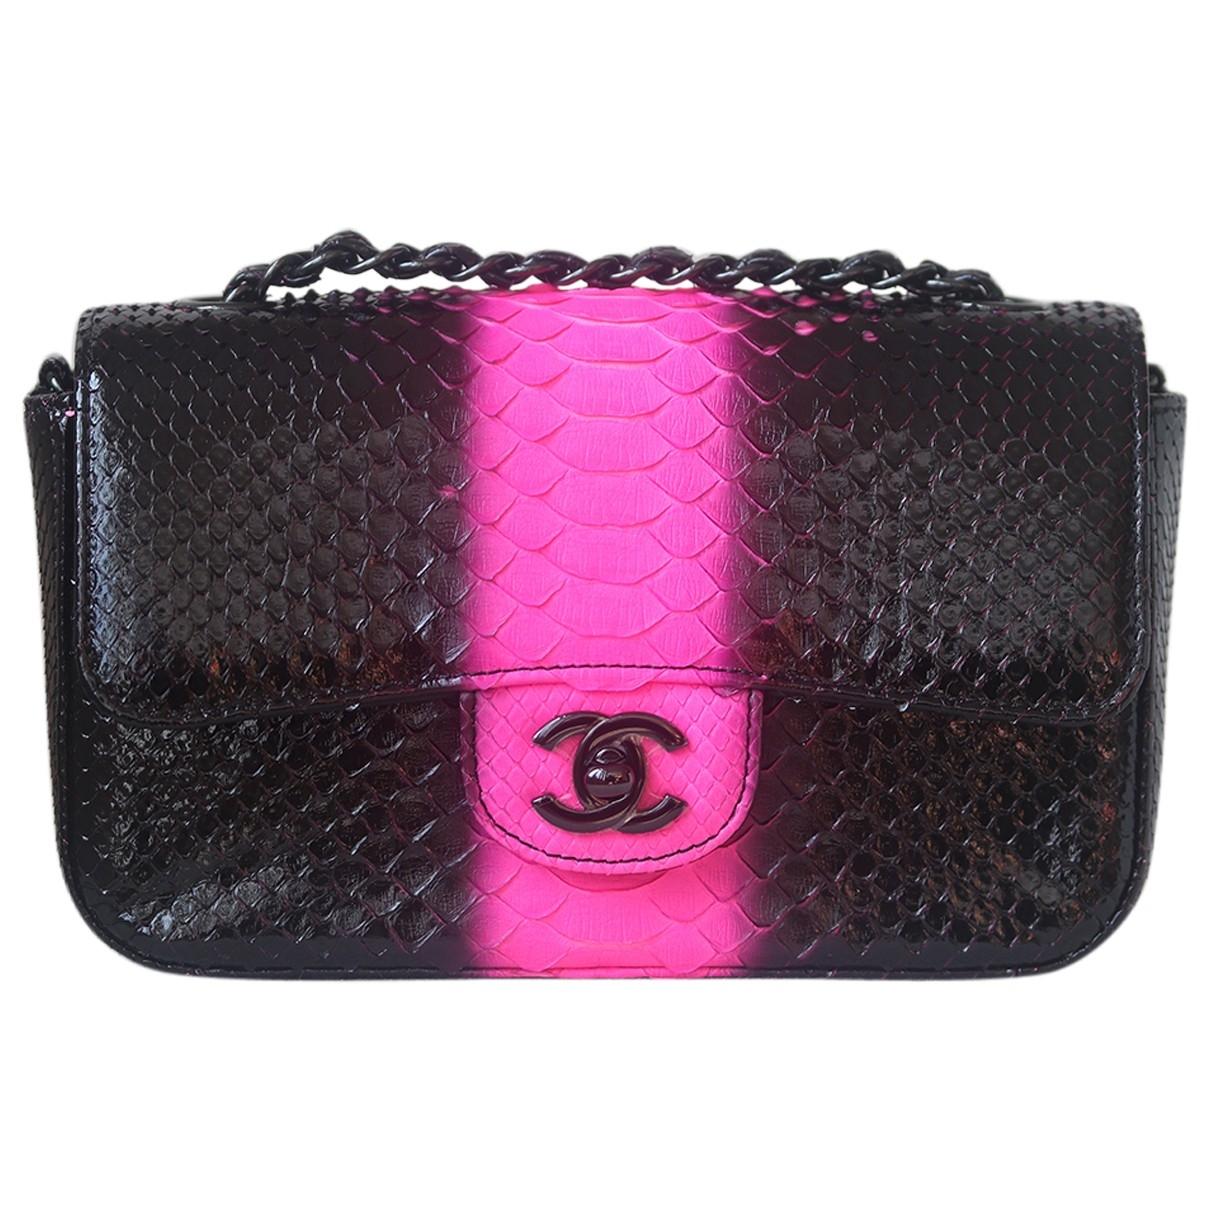 Chanel \N Black Python handbag for Women \N